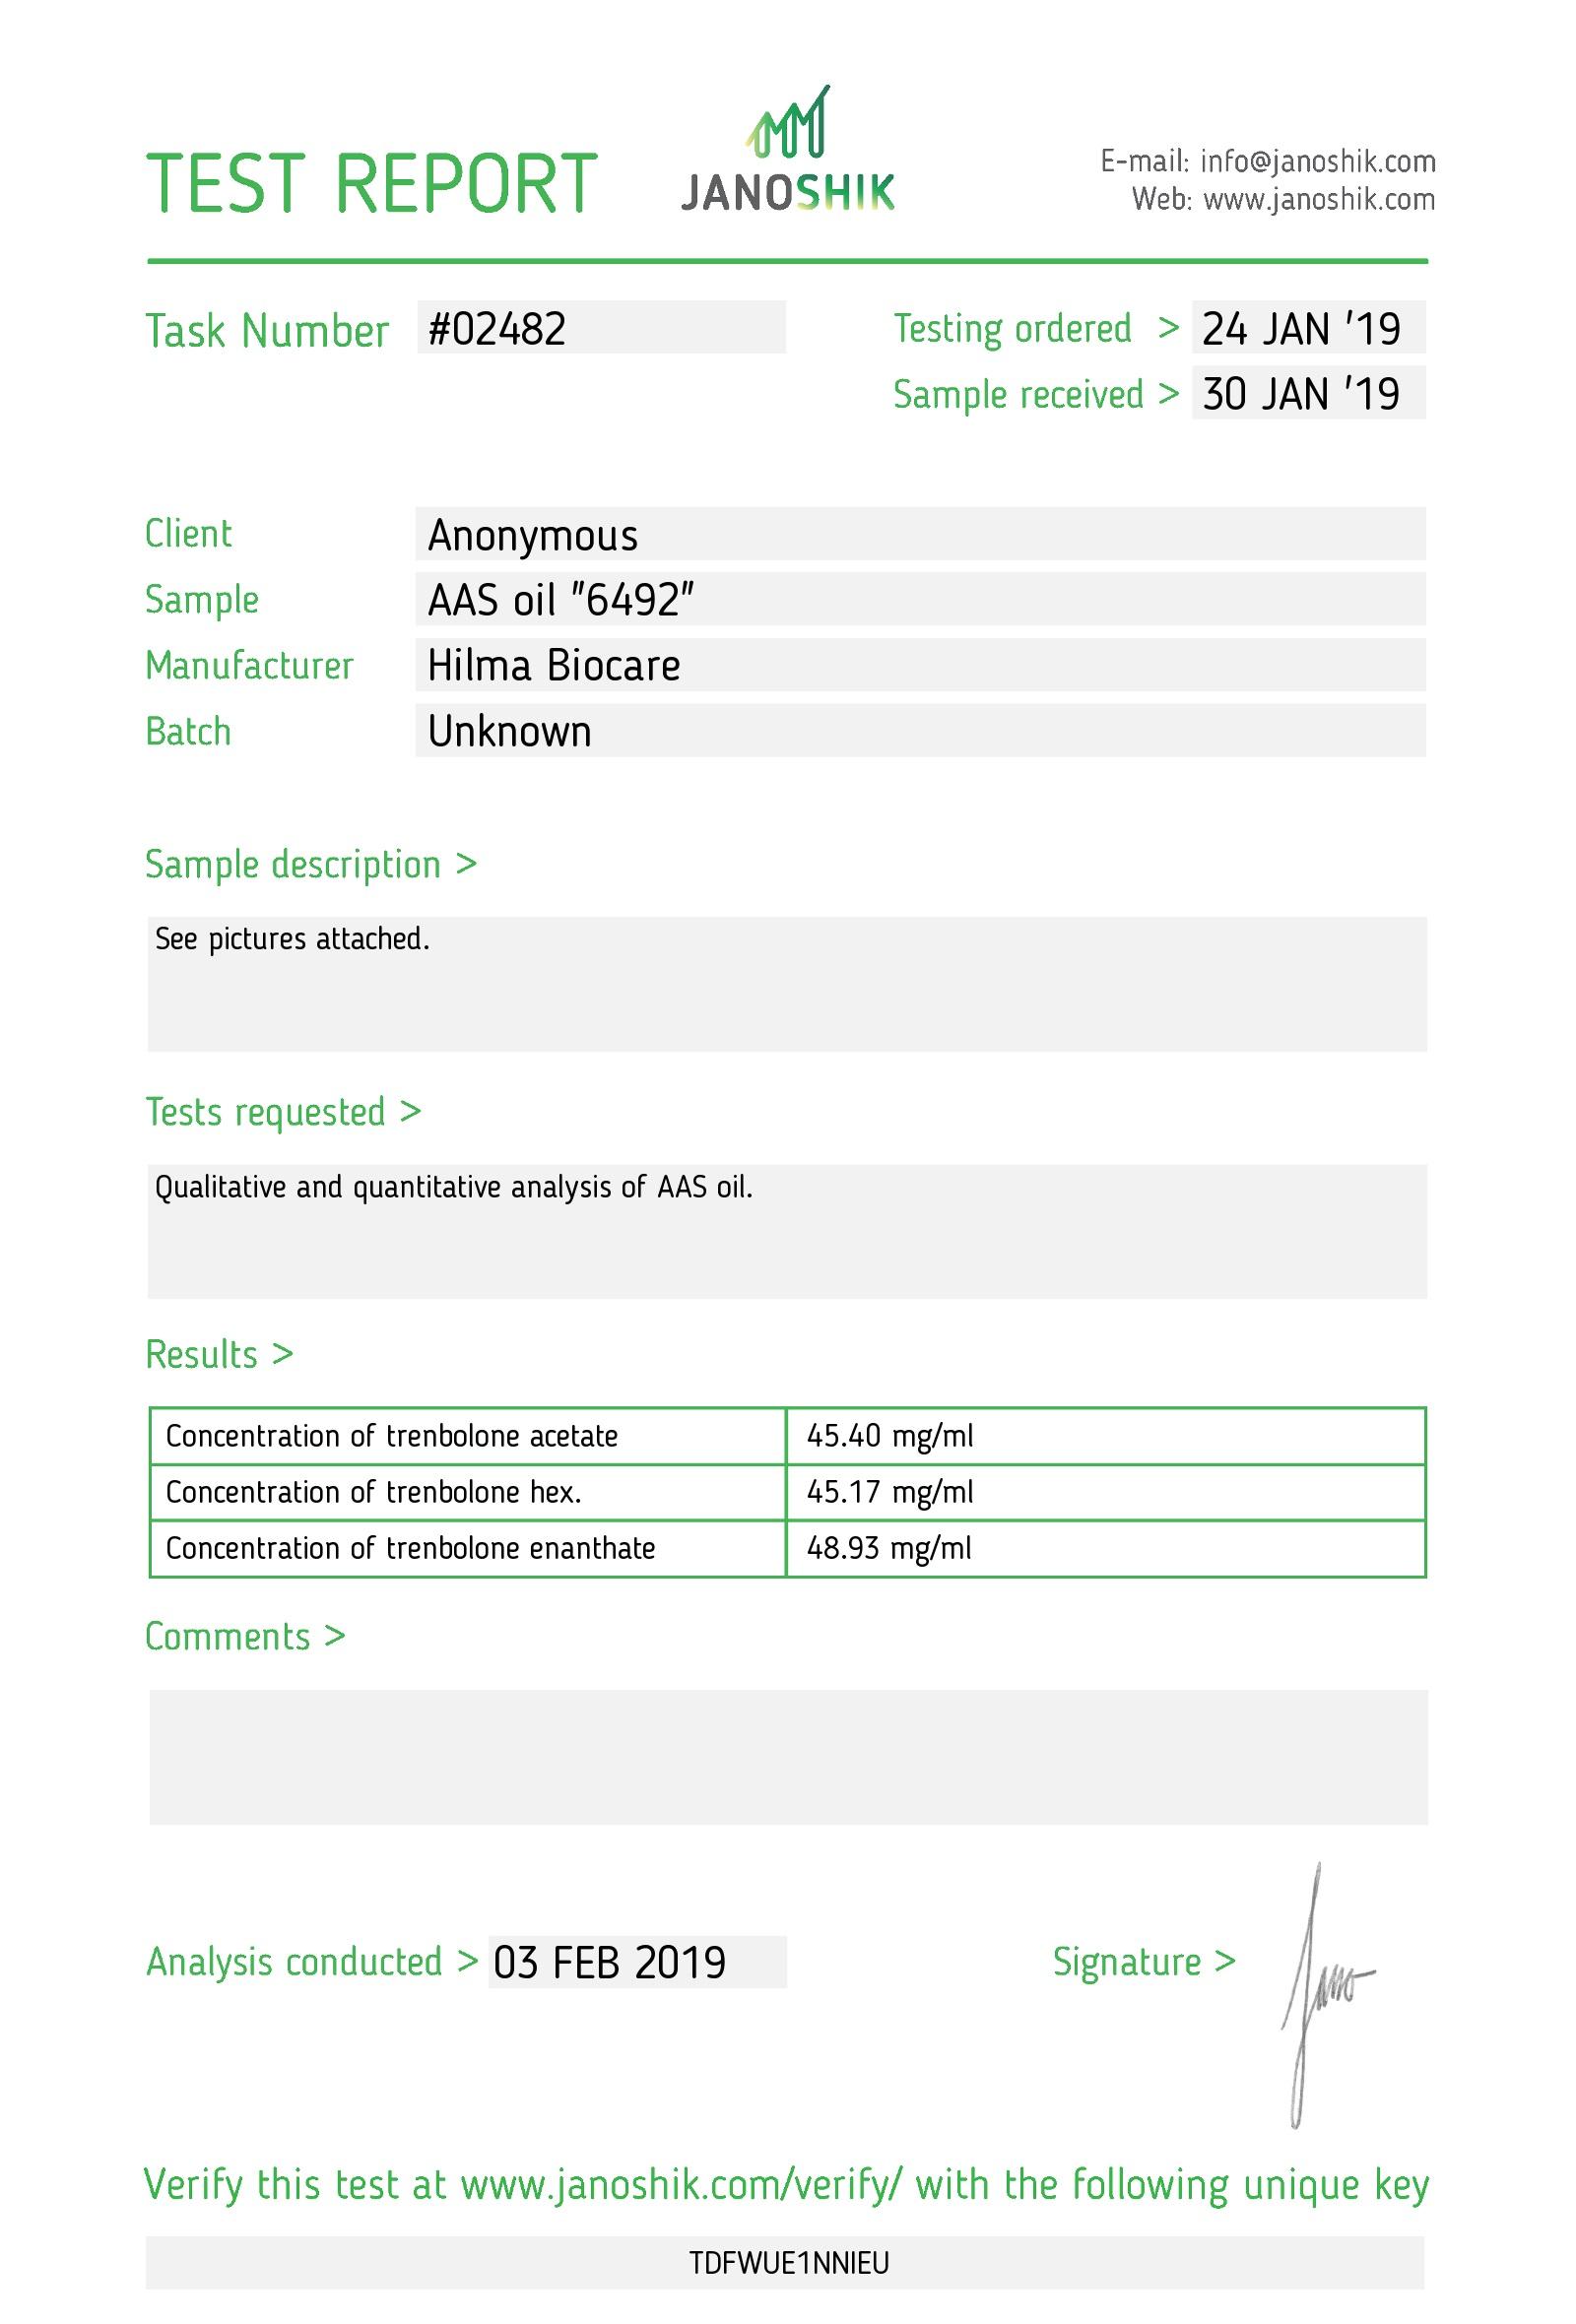 hhttps://anabolicgear.net/img/labtest/hilma/trenbolone-mix.jpg